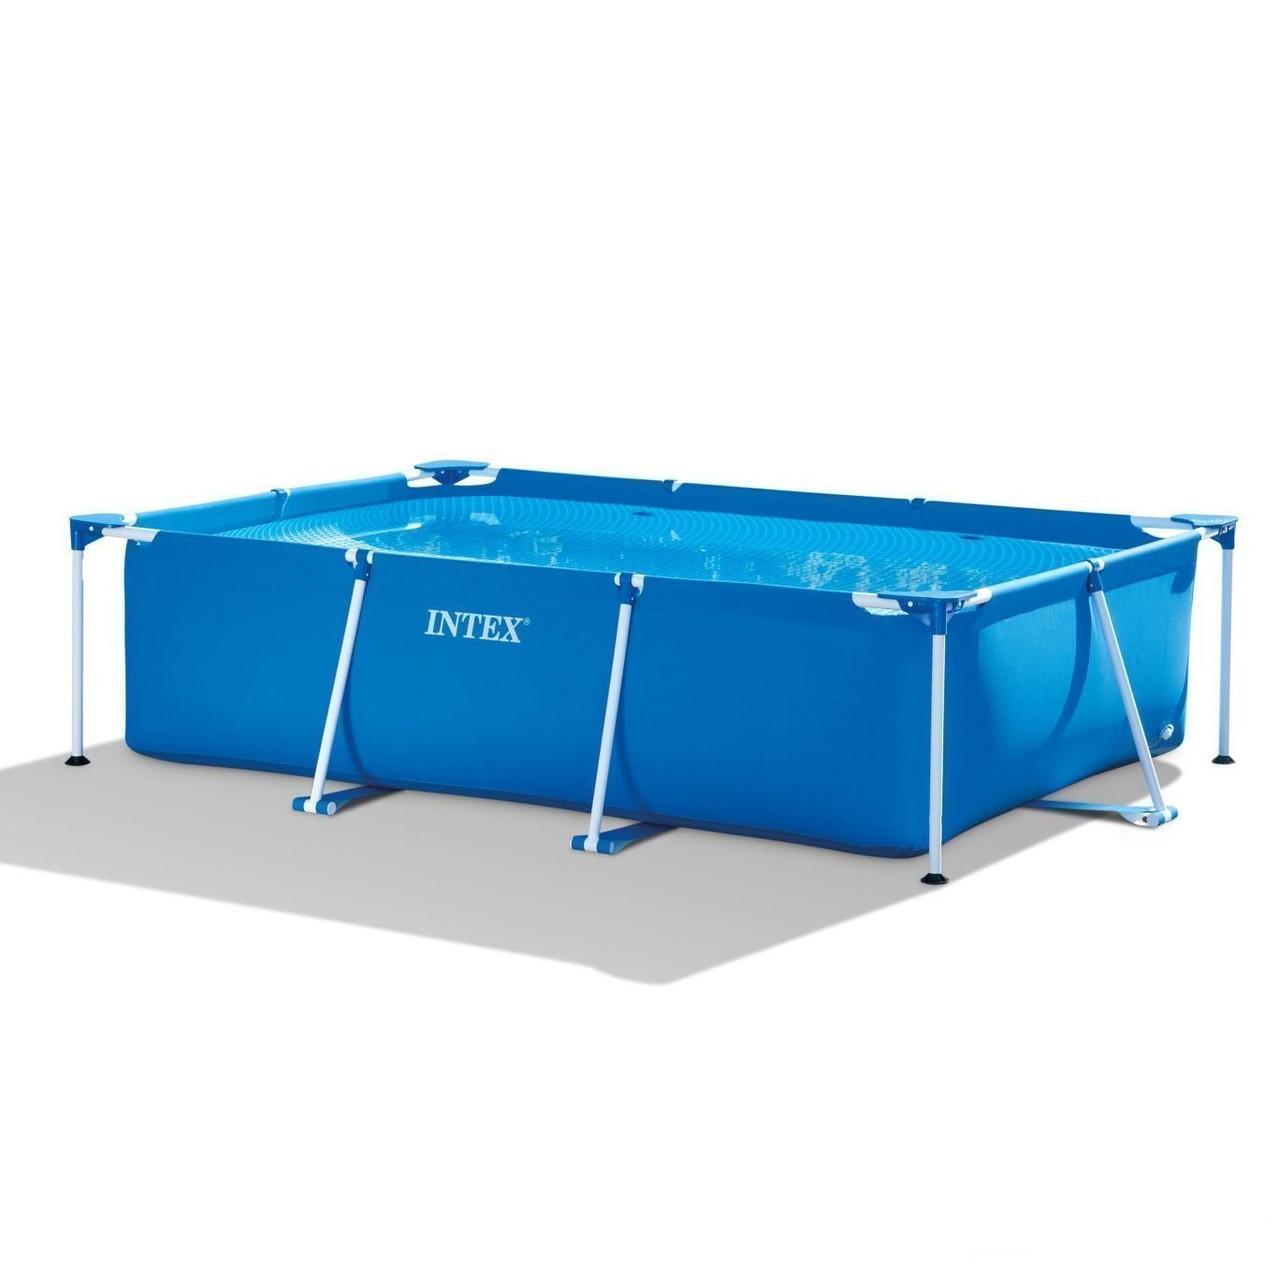 Каркасный семейный бассейн басейн Intex 28274 Басейн